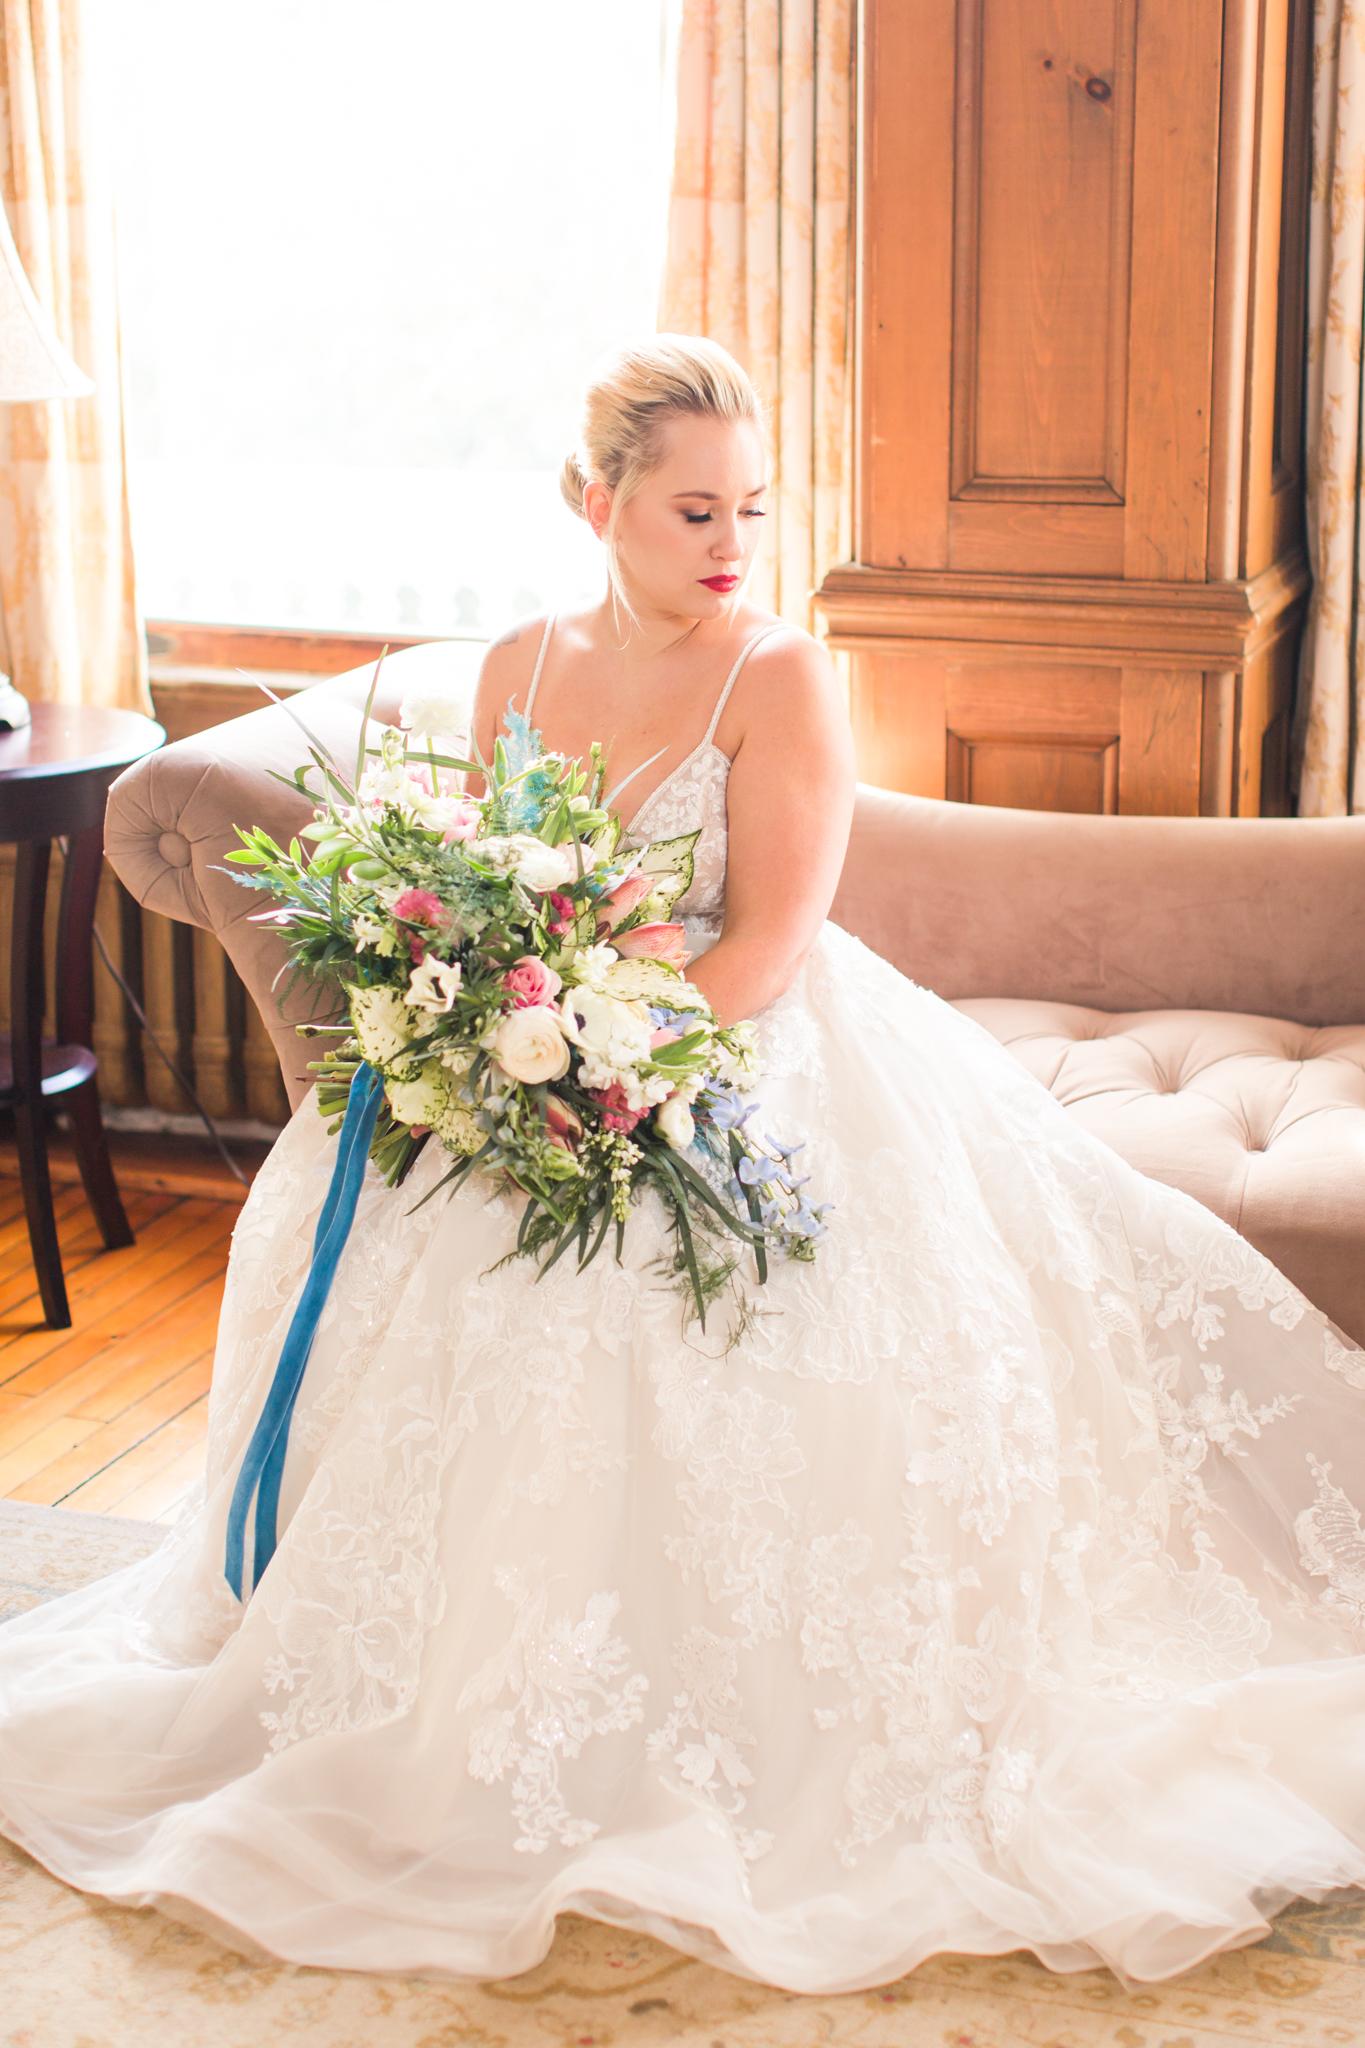 Haley Mansion Winter Wedding - Shaina Lee Photography-276.jpg